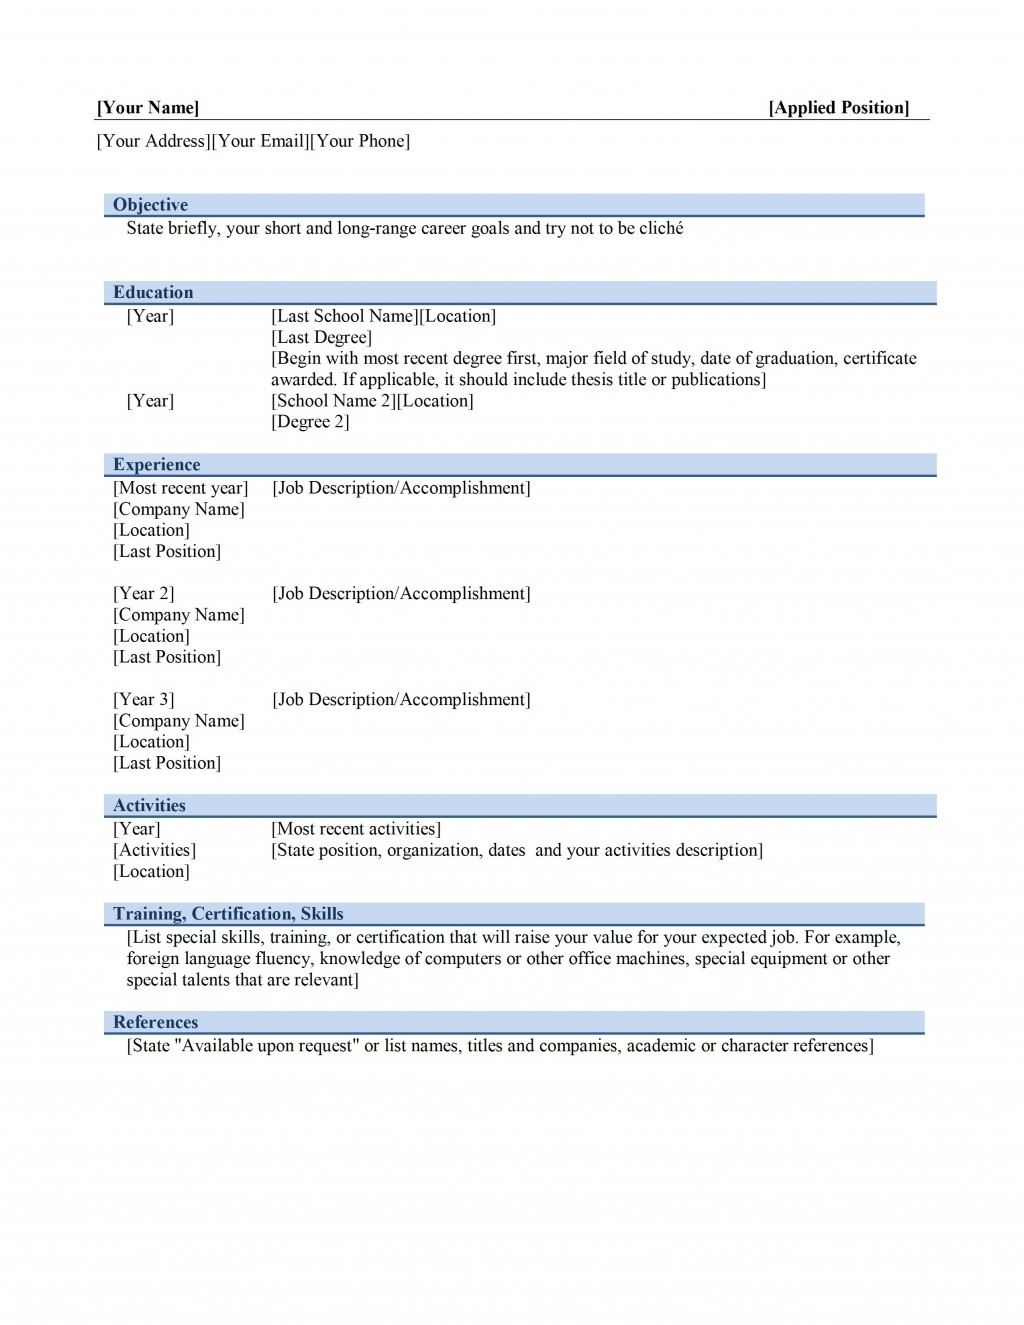 Resume Word Format Job Graphic Designer M  Ms Template Design Microsoft Office Free DownloadLarge